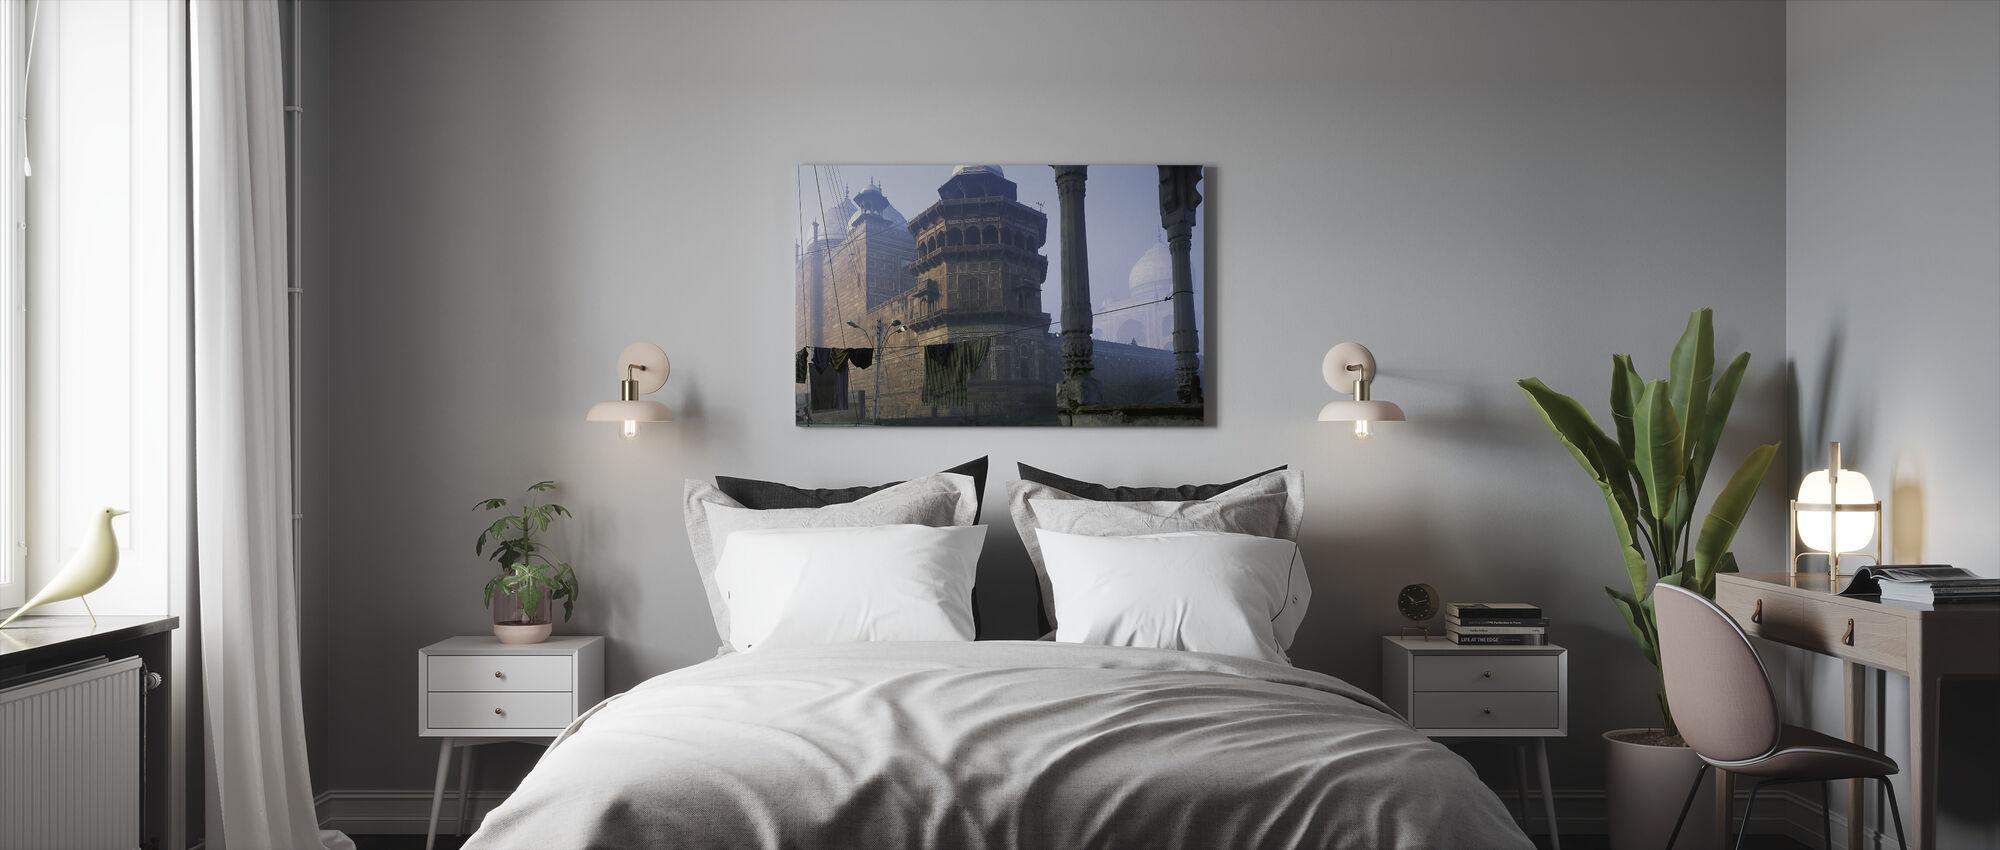 Taj Mahal, Agra, India - Canvas print - Bedroom